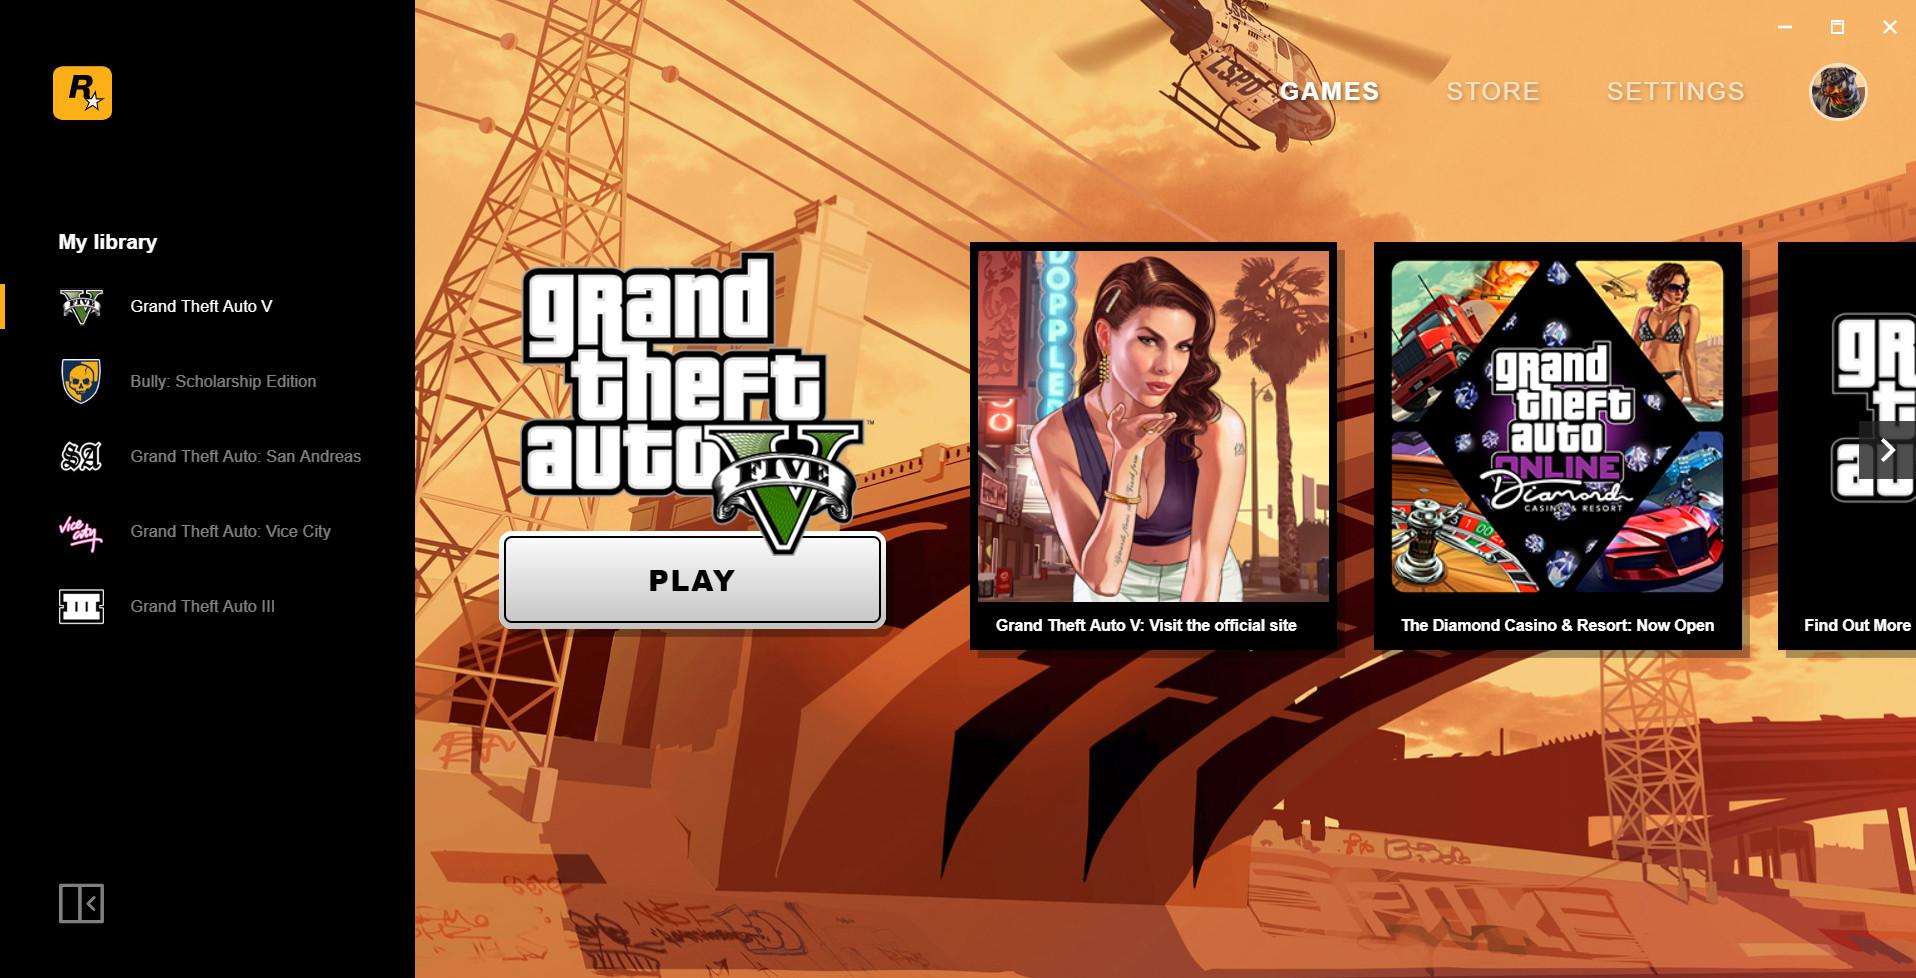 Rockstar Games Launcher - klient do gier od firmy Rockastar Games 1